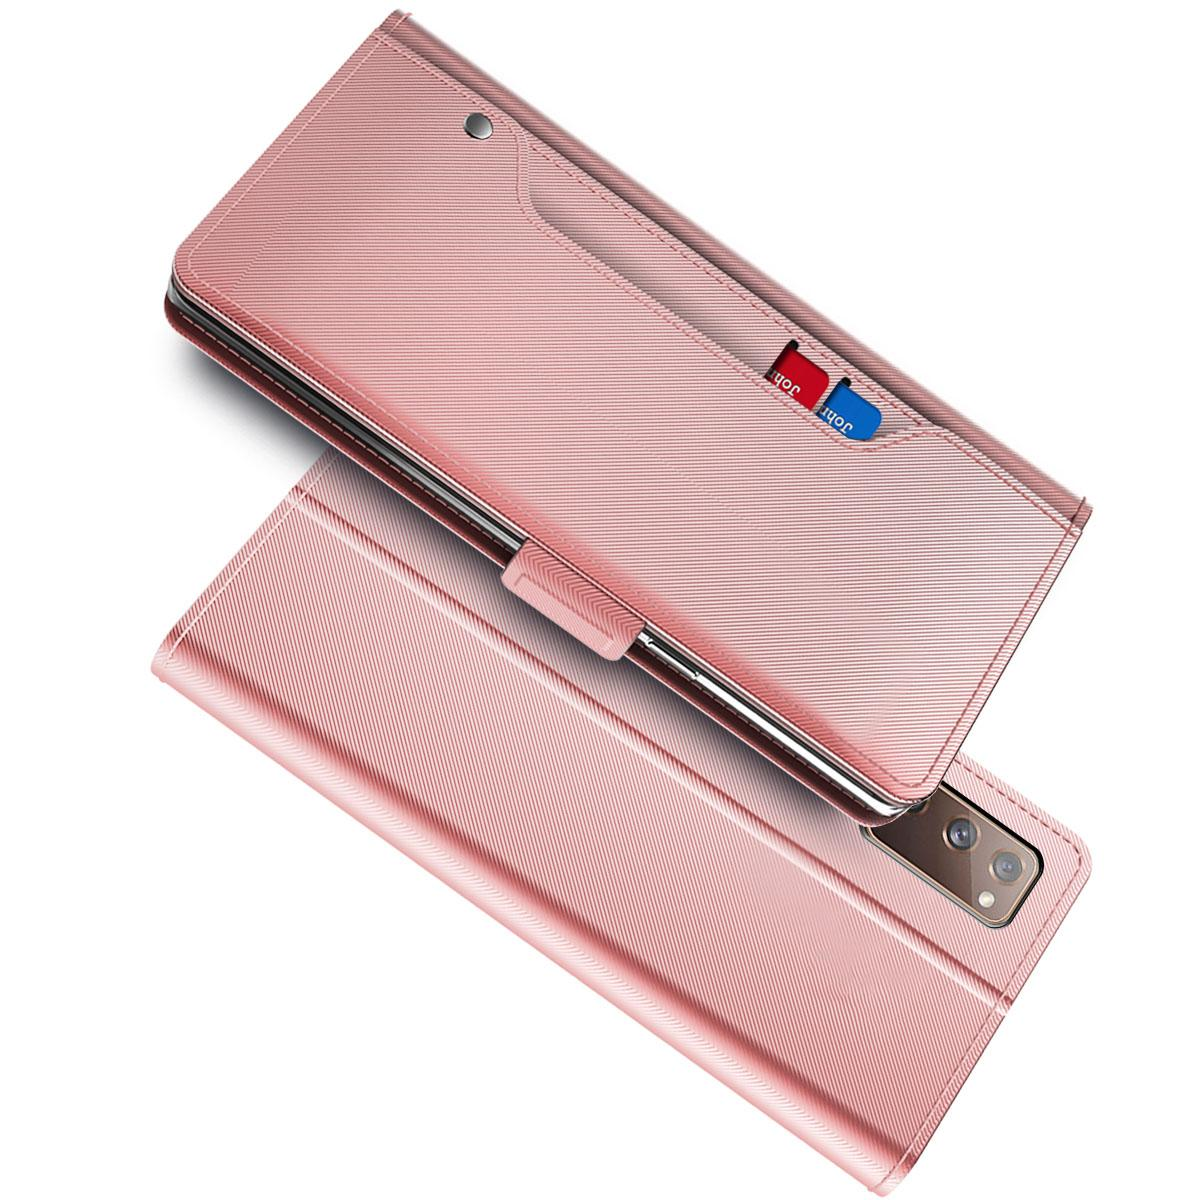 Suojakotelo Peili Galaxy A52/A52s Vaaleanpunainen